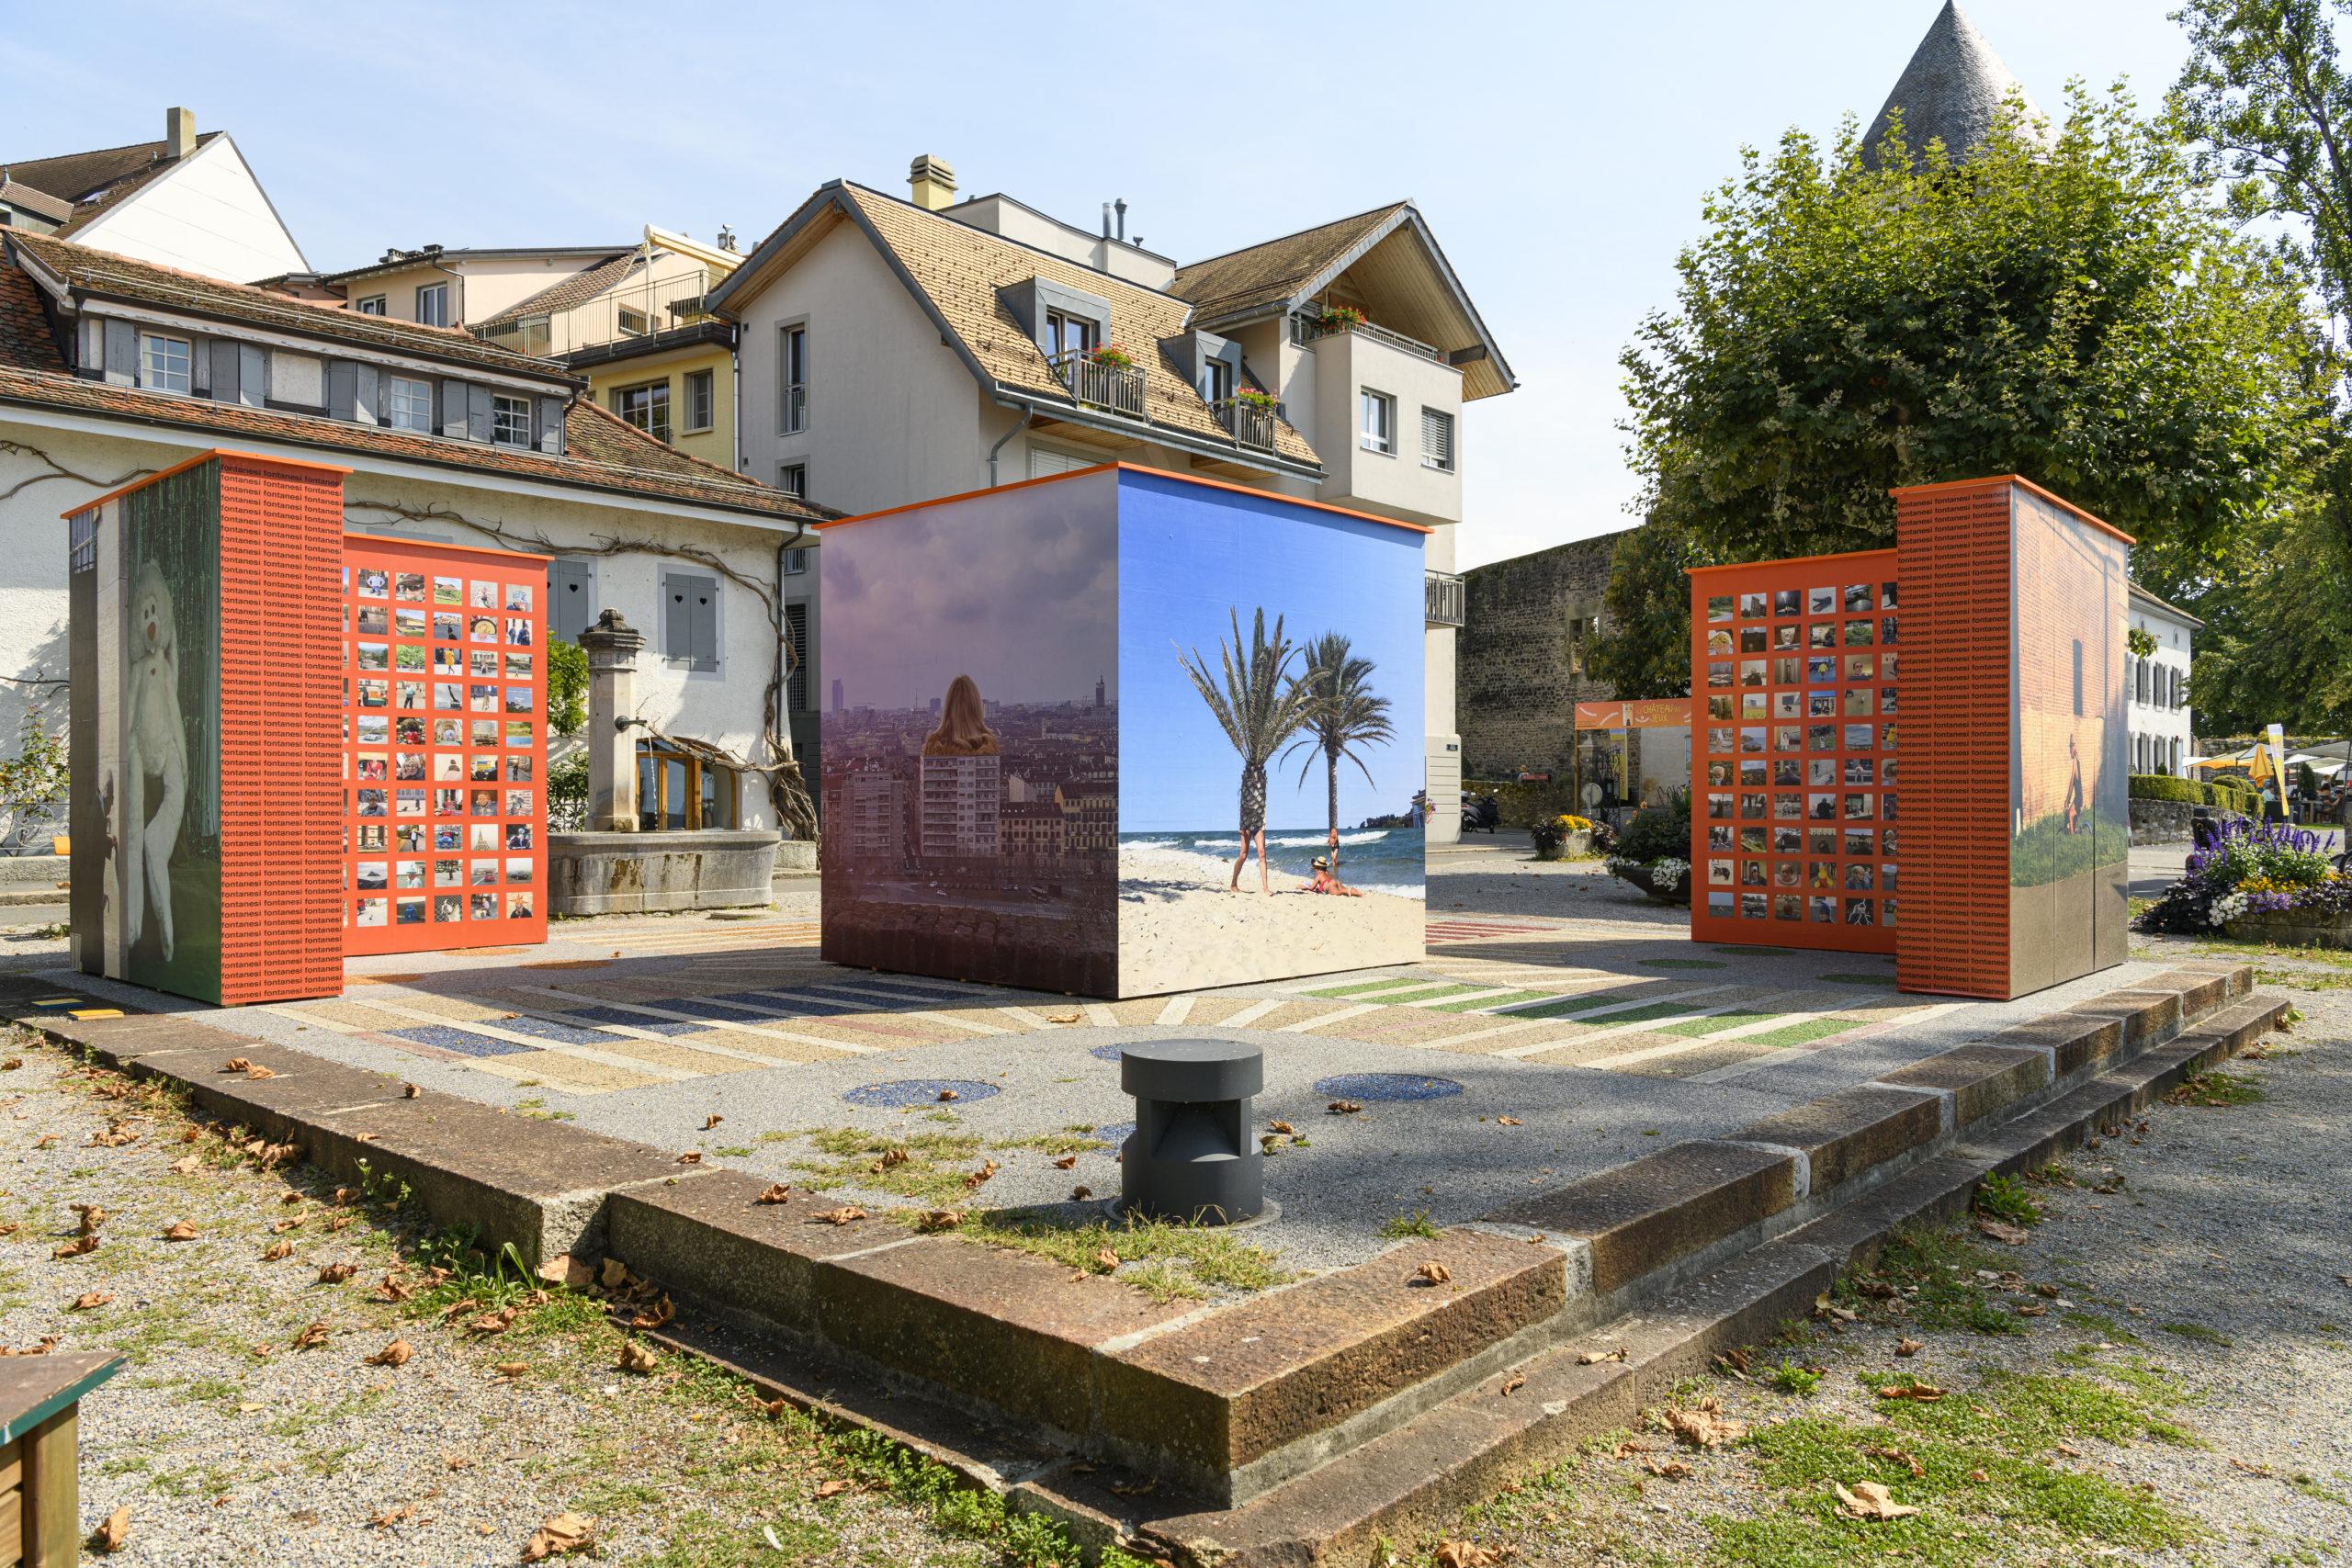 Festival Images Vevey 2020 – Kublaiklan Fontanesi – Place Four © EmilienItim